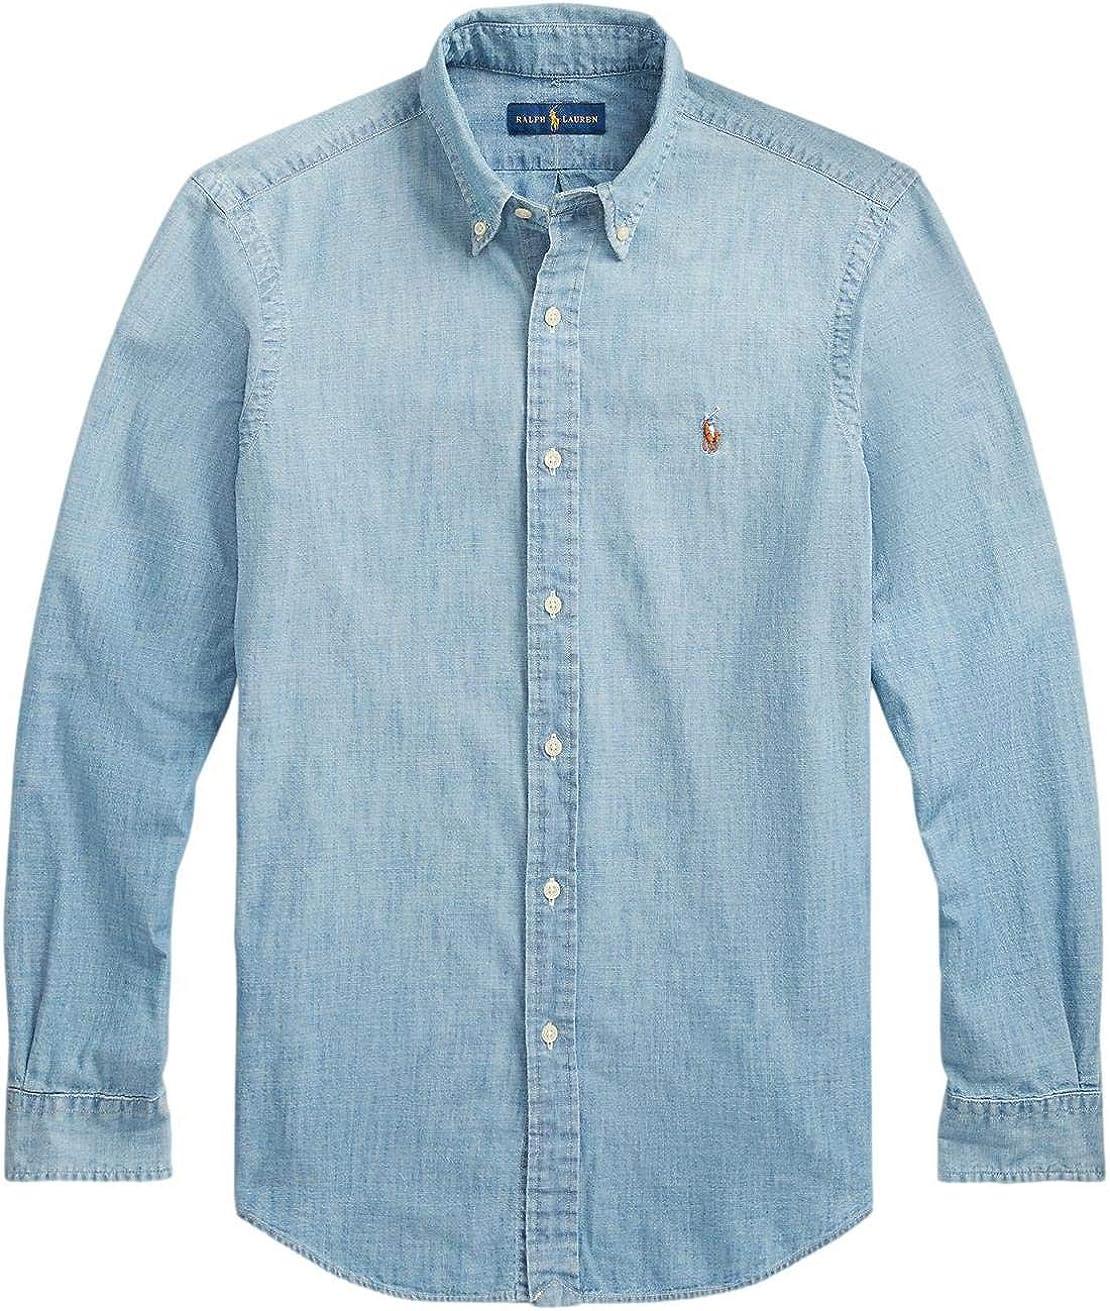 Polo Ralph Lauren Men's Big and Tall Long Sleeves Classic Fit Oxford Buttondown Shirt (XLT, LiteChambray)